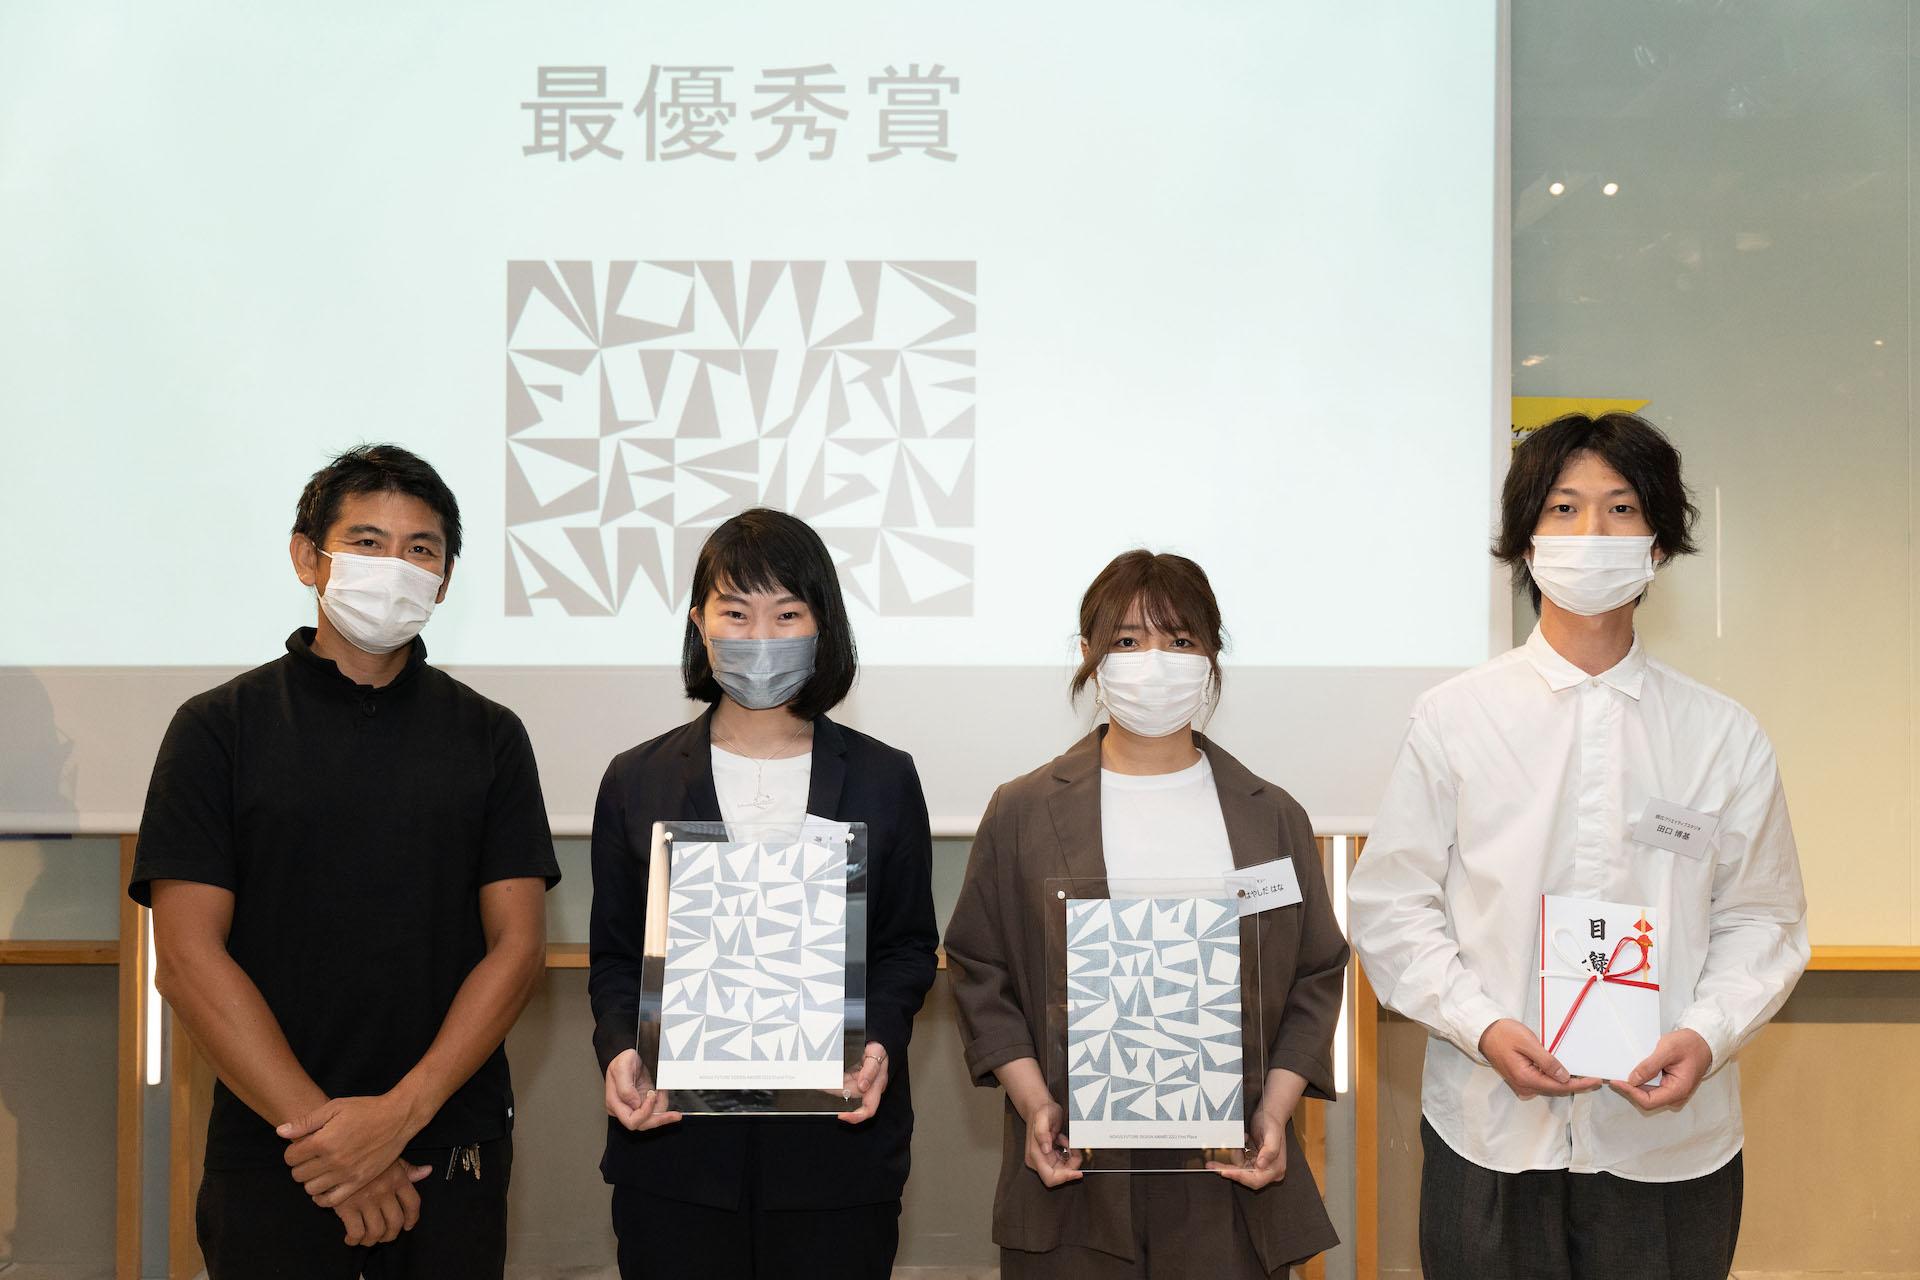 273 NOVUS FUTURE DESIGN AWARD 6つの受賞作が決定